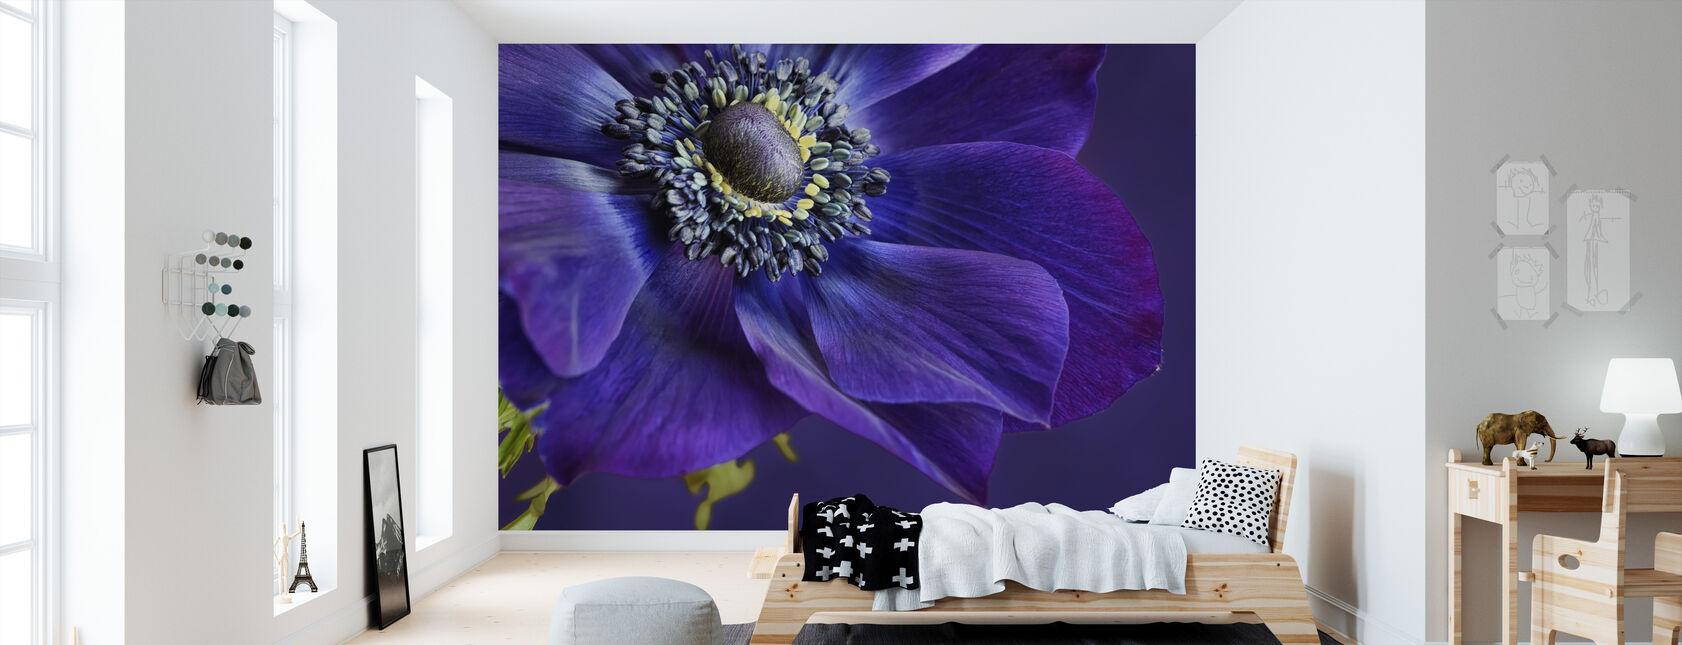 Purple wall murals